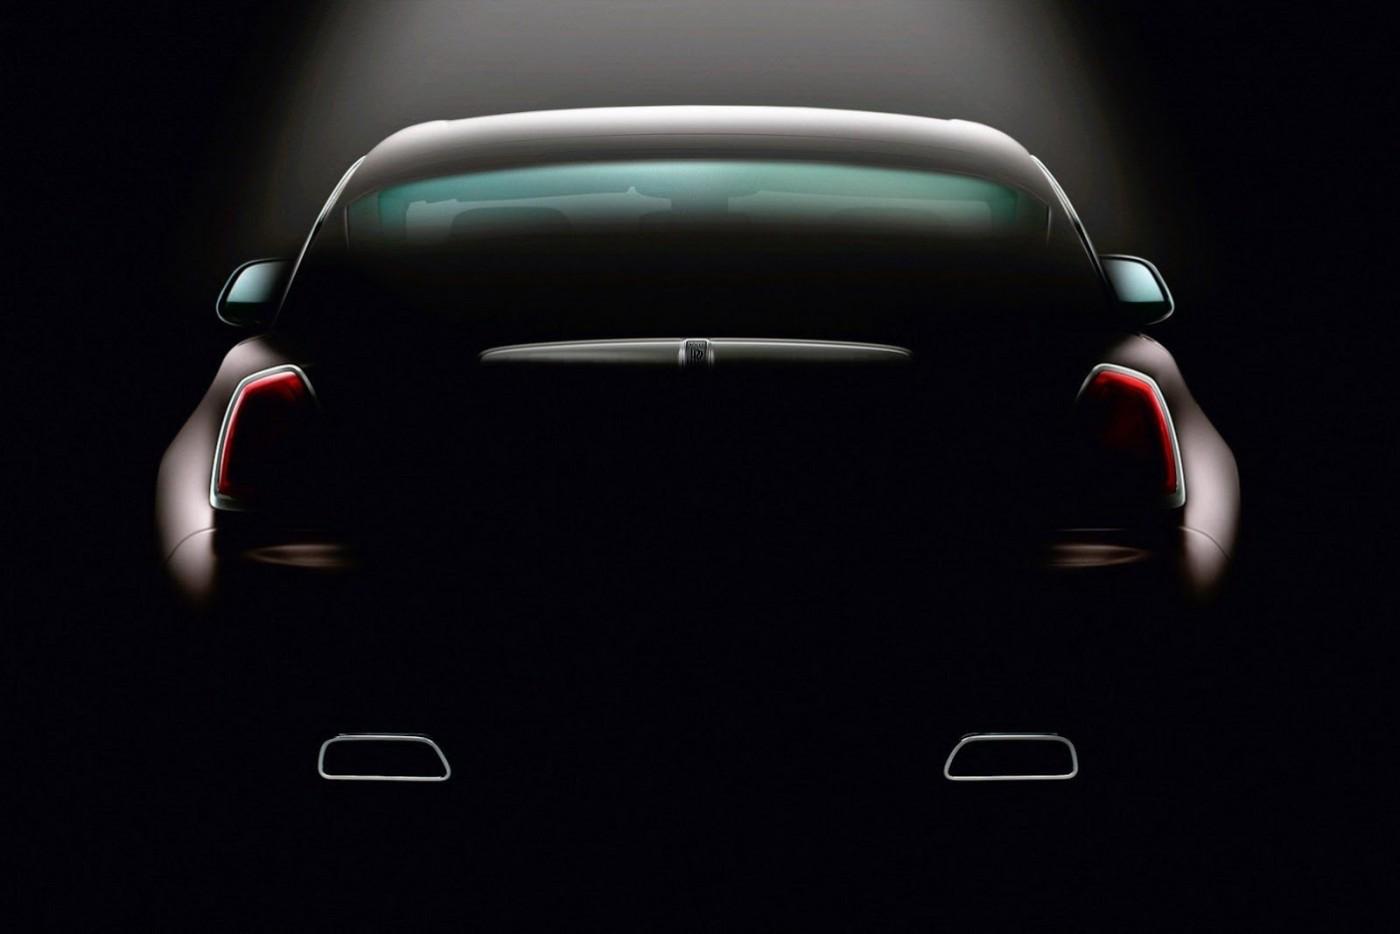 Rolls-Royce Wraith: Power, Style, Drama